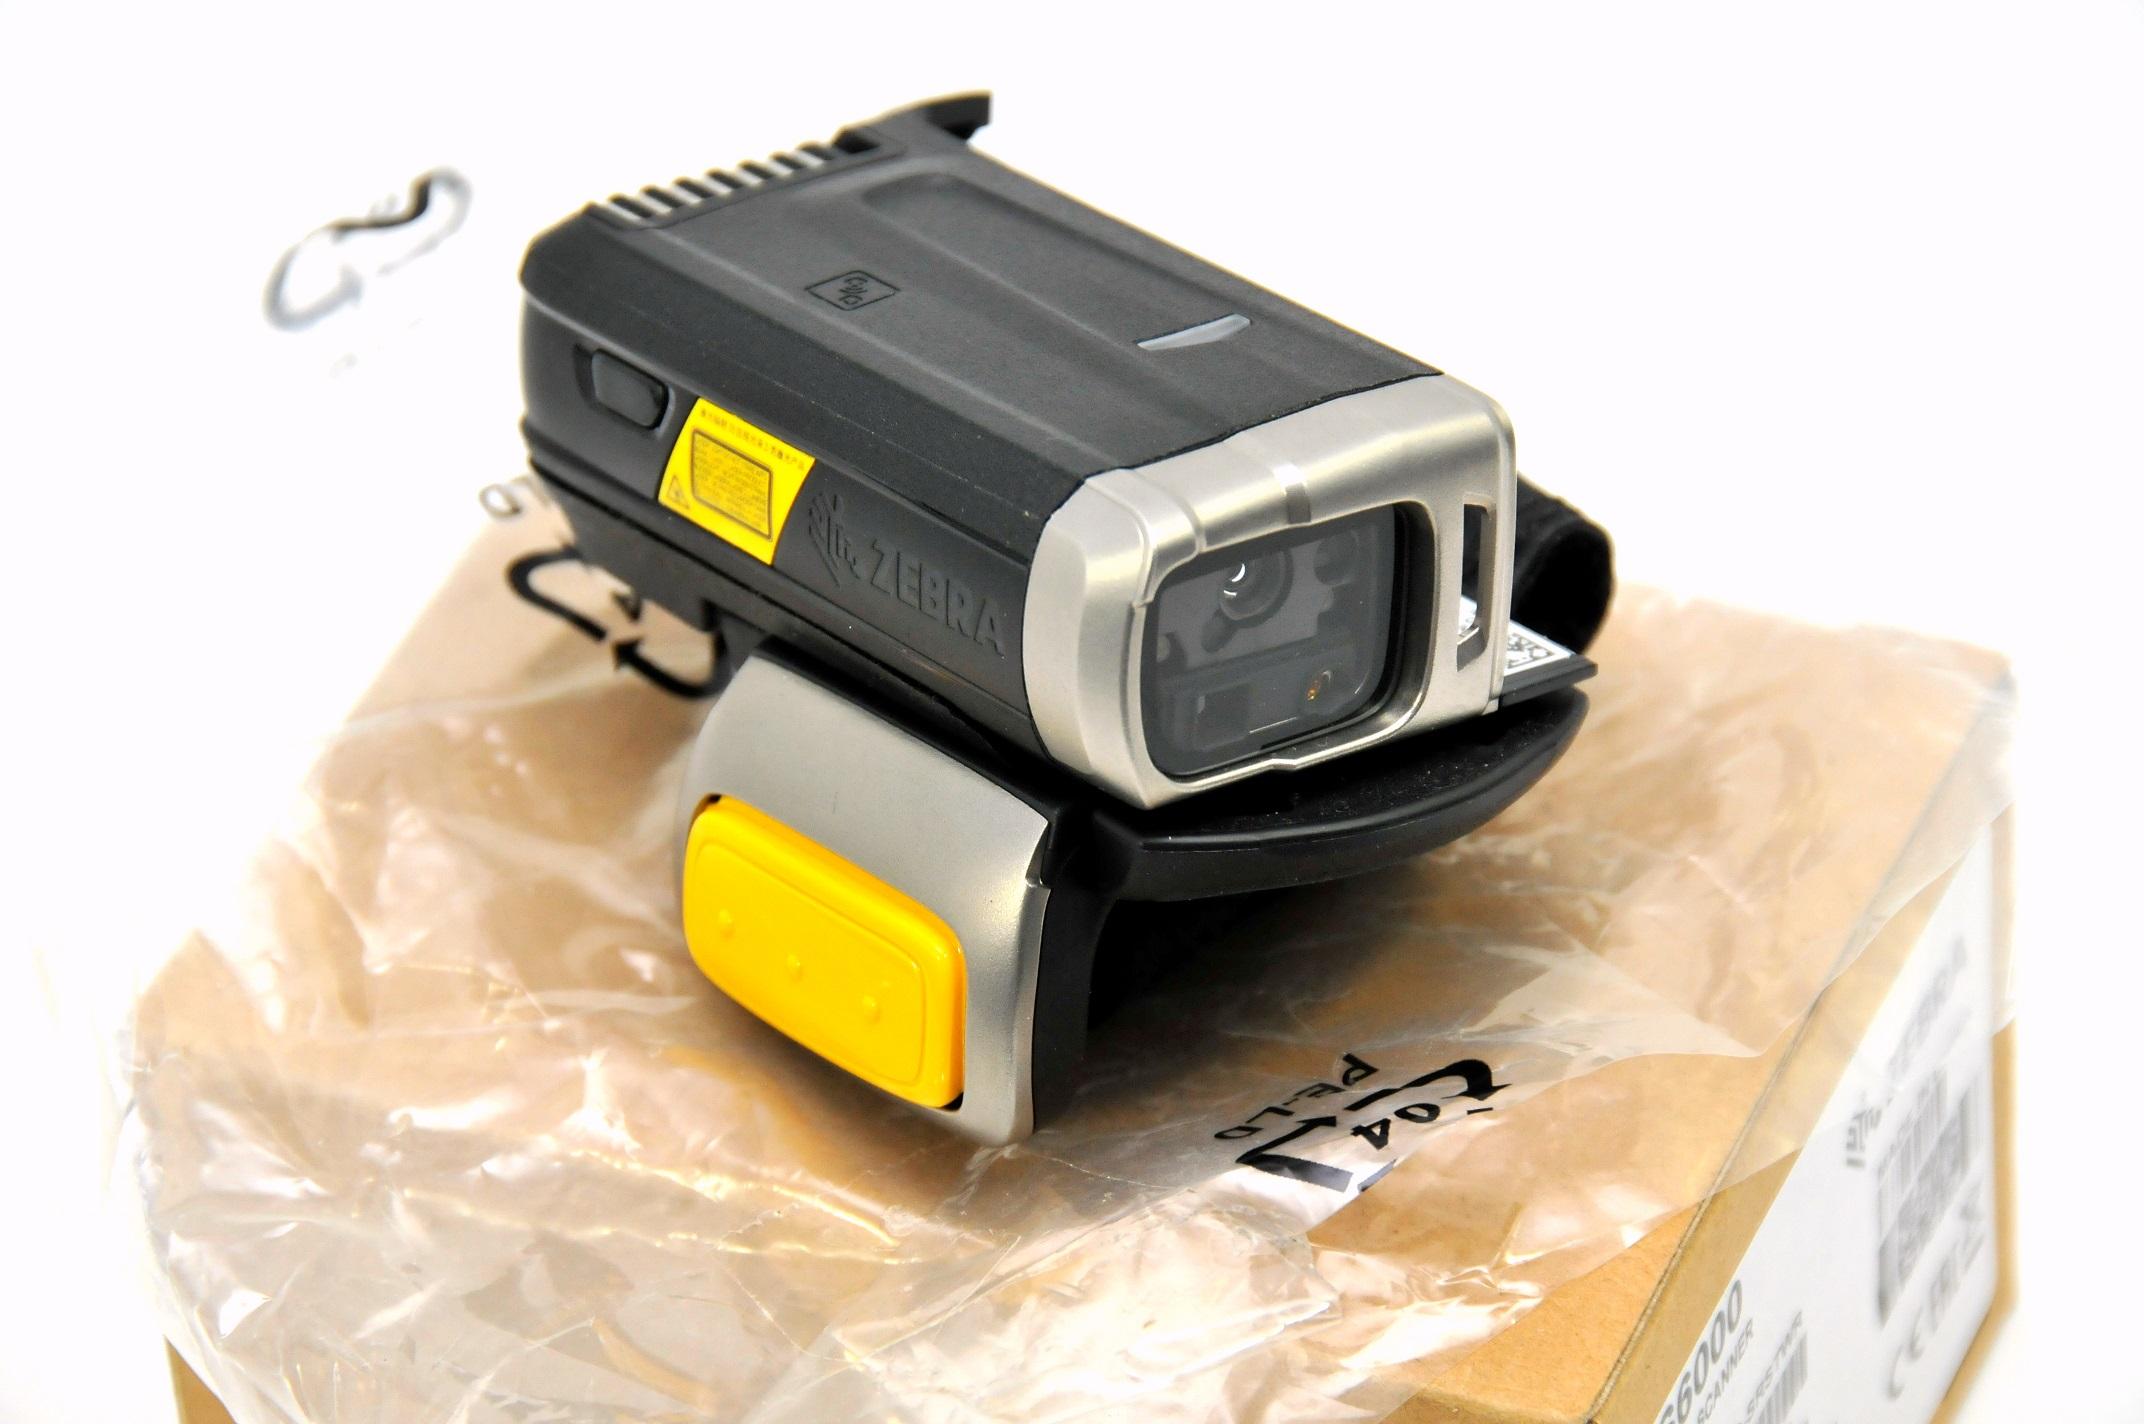 zebra-scanner-barcode-scanner-barcode-repair